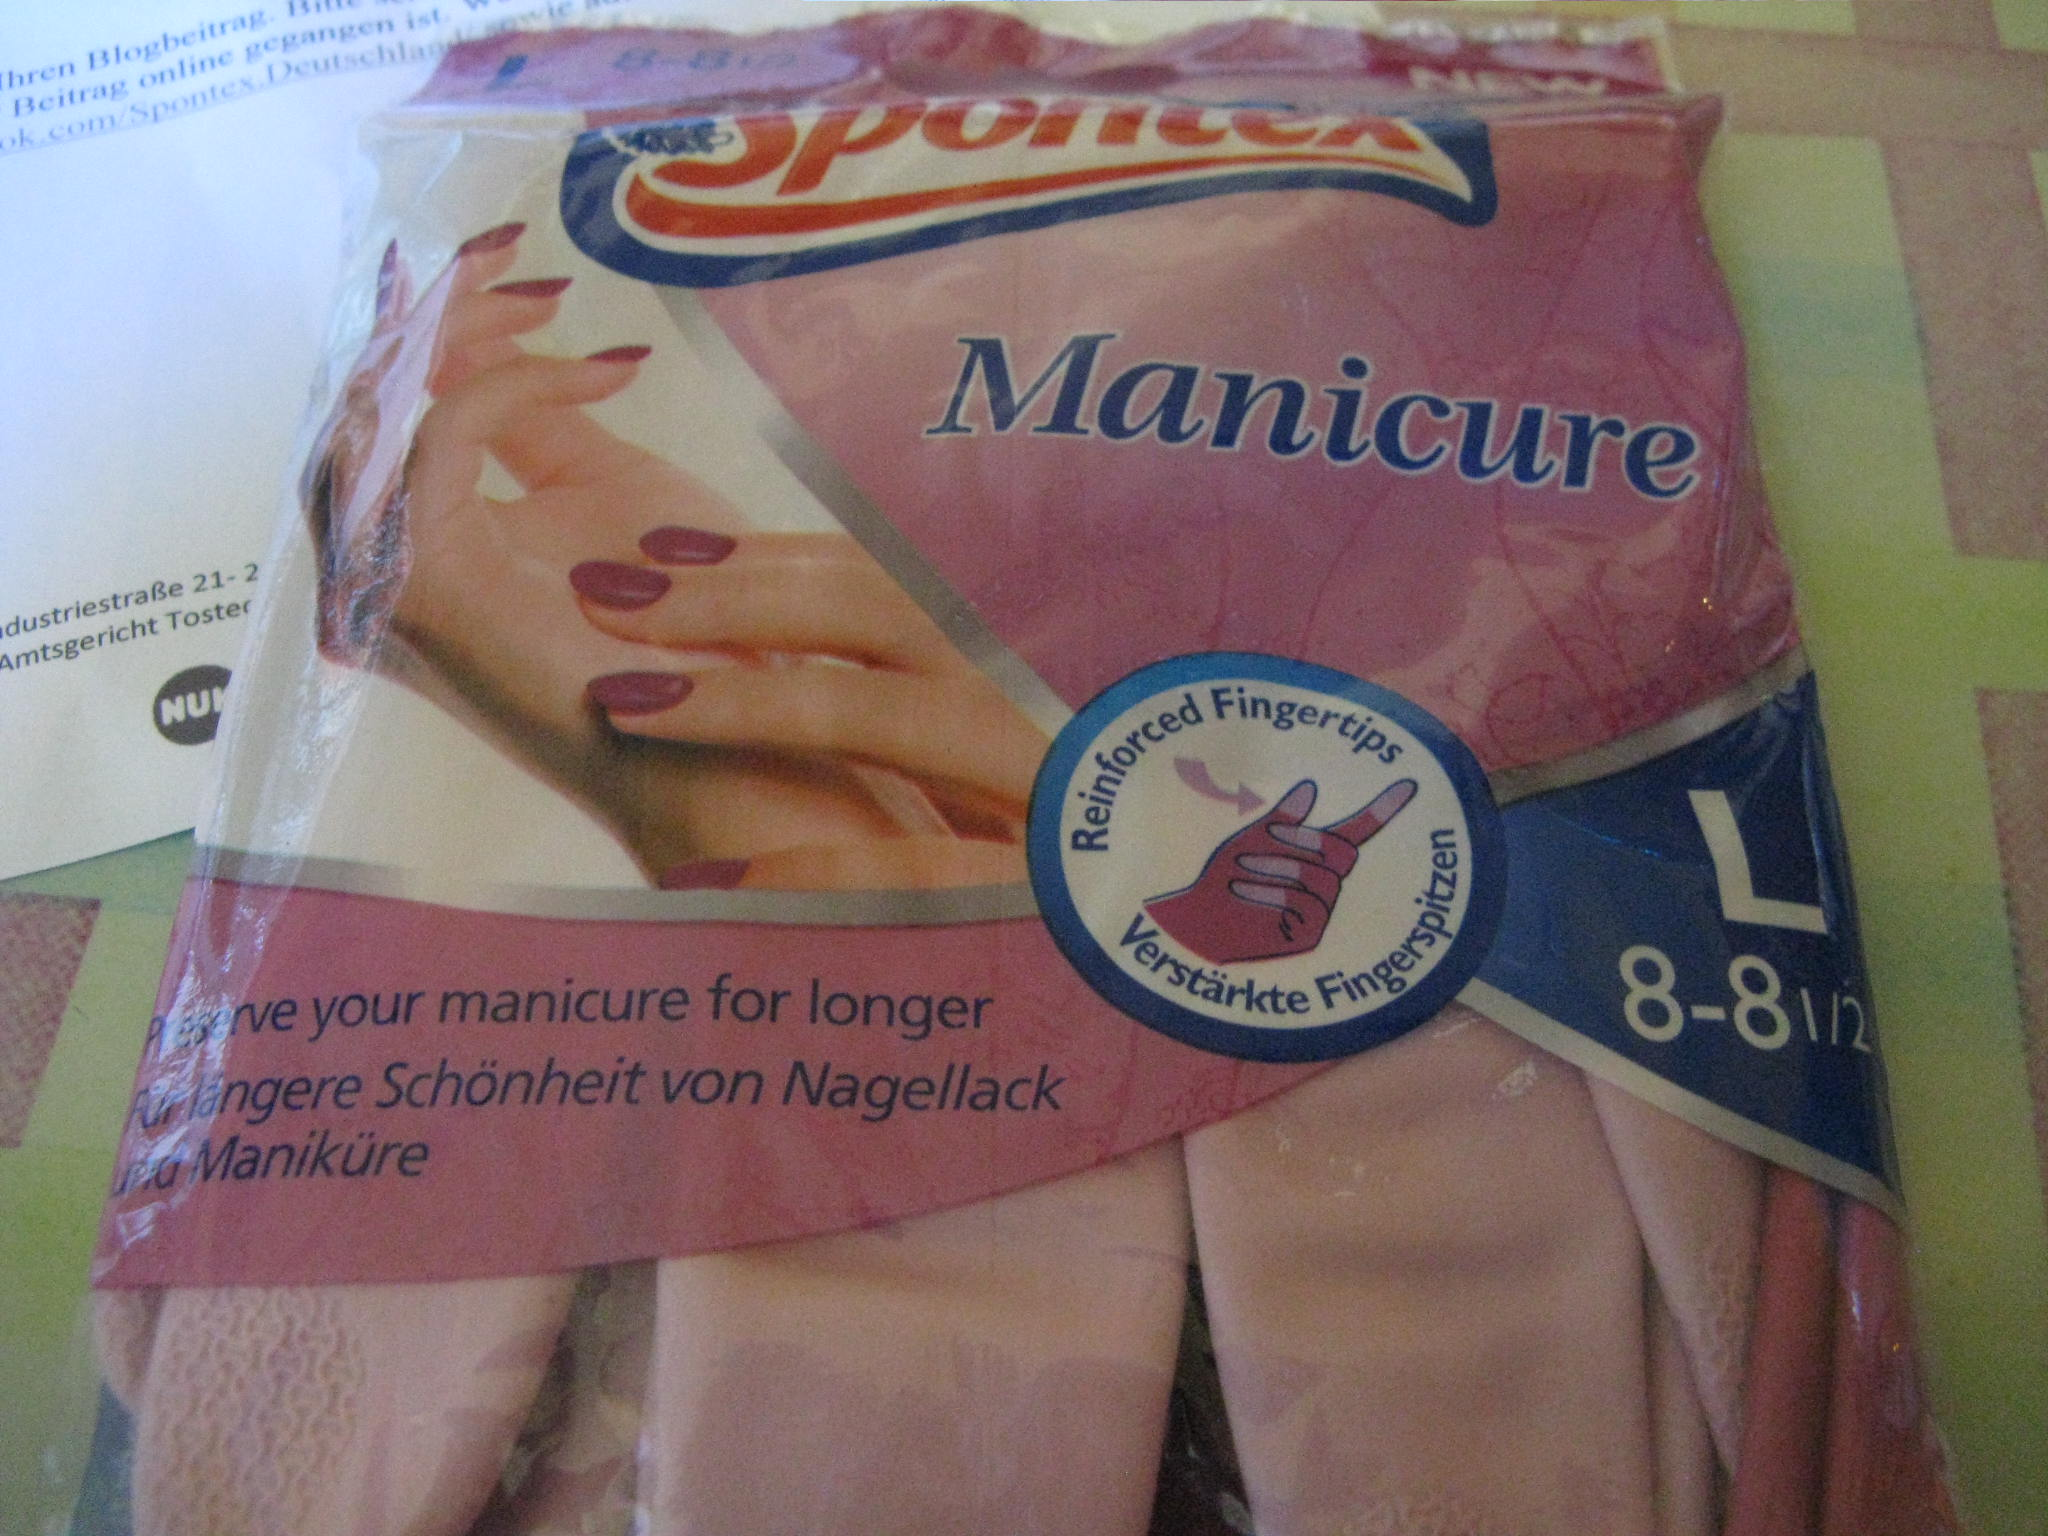 Spontex Manicure Handschuhe